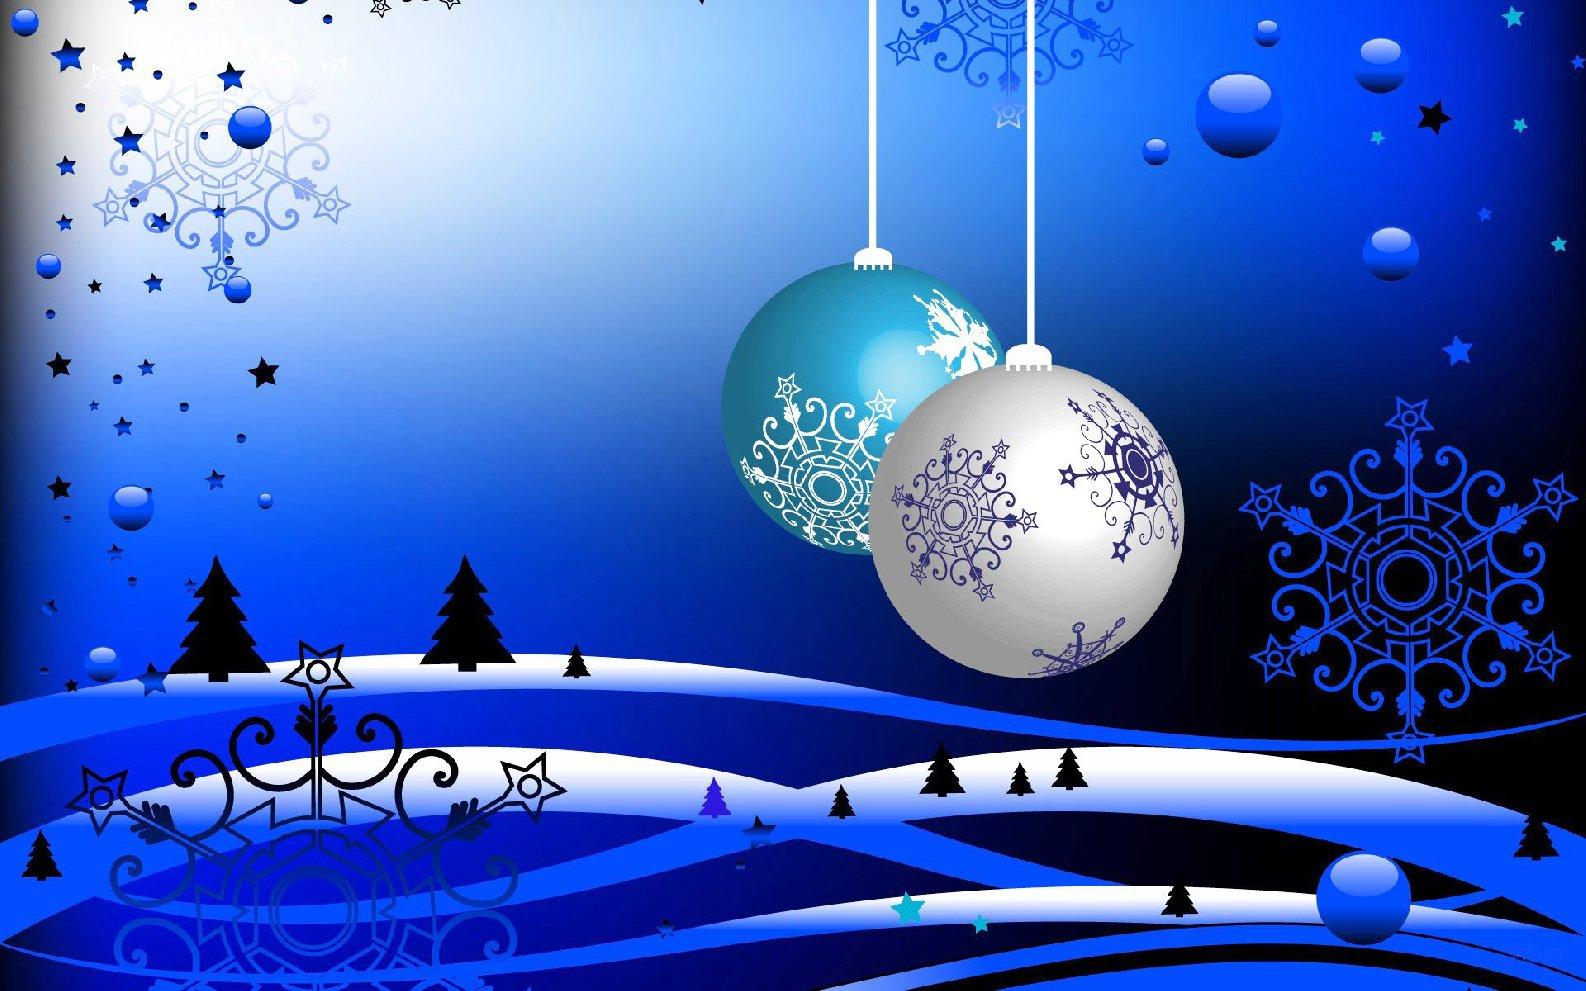 Windows Christmas Desktop Backgrounds 1586x991 Wallpaper Teahub Io